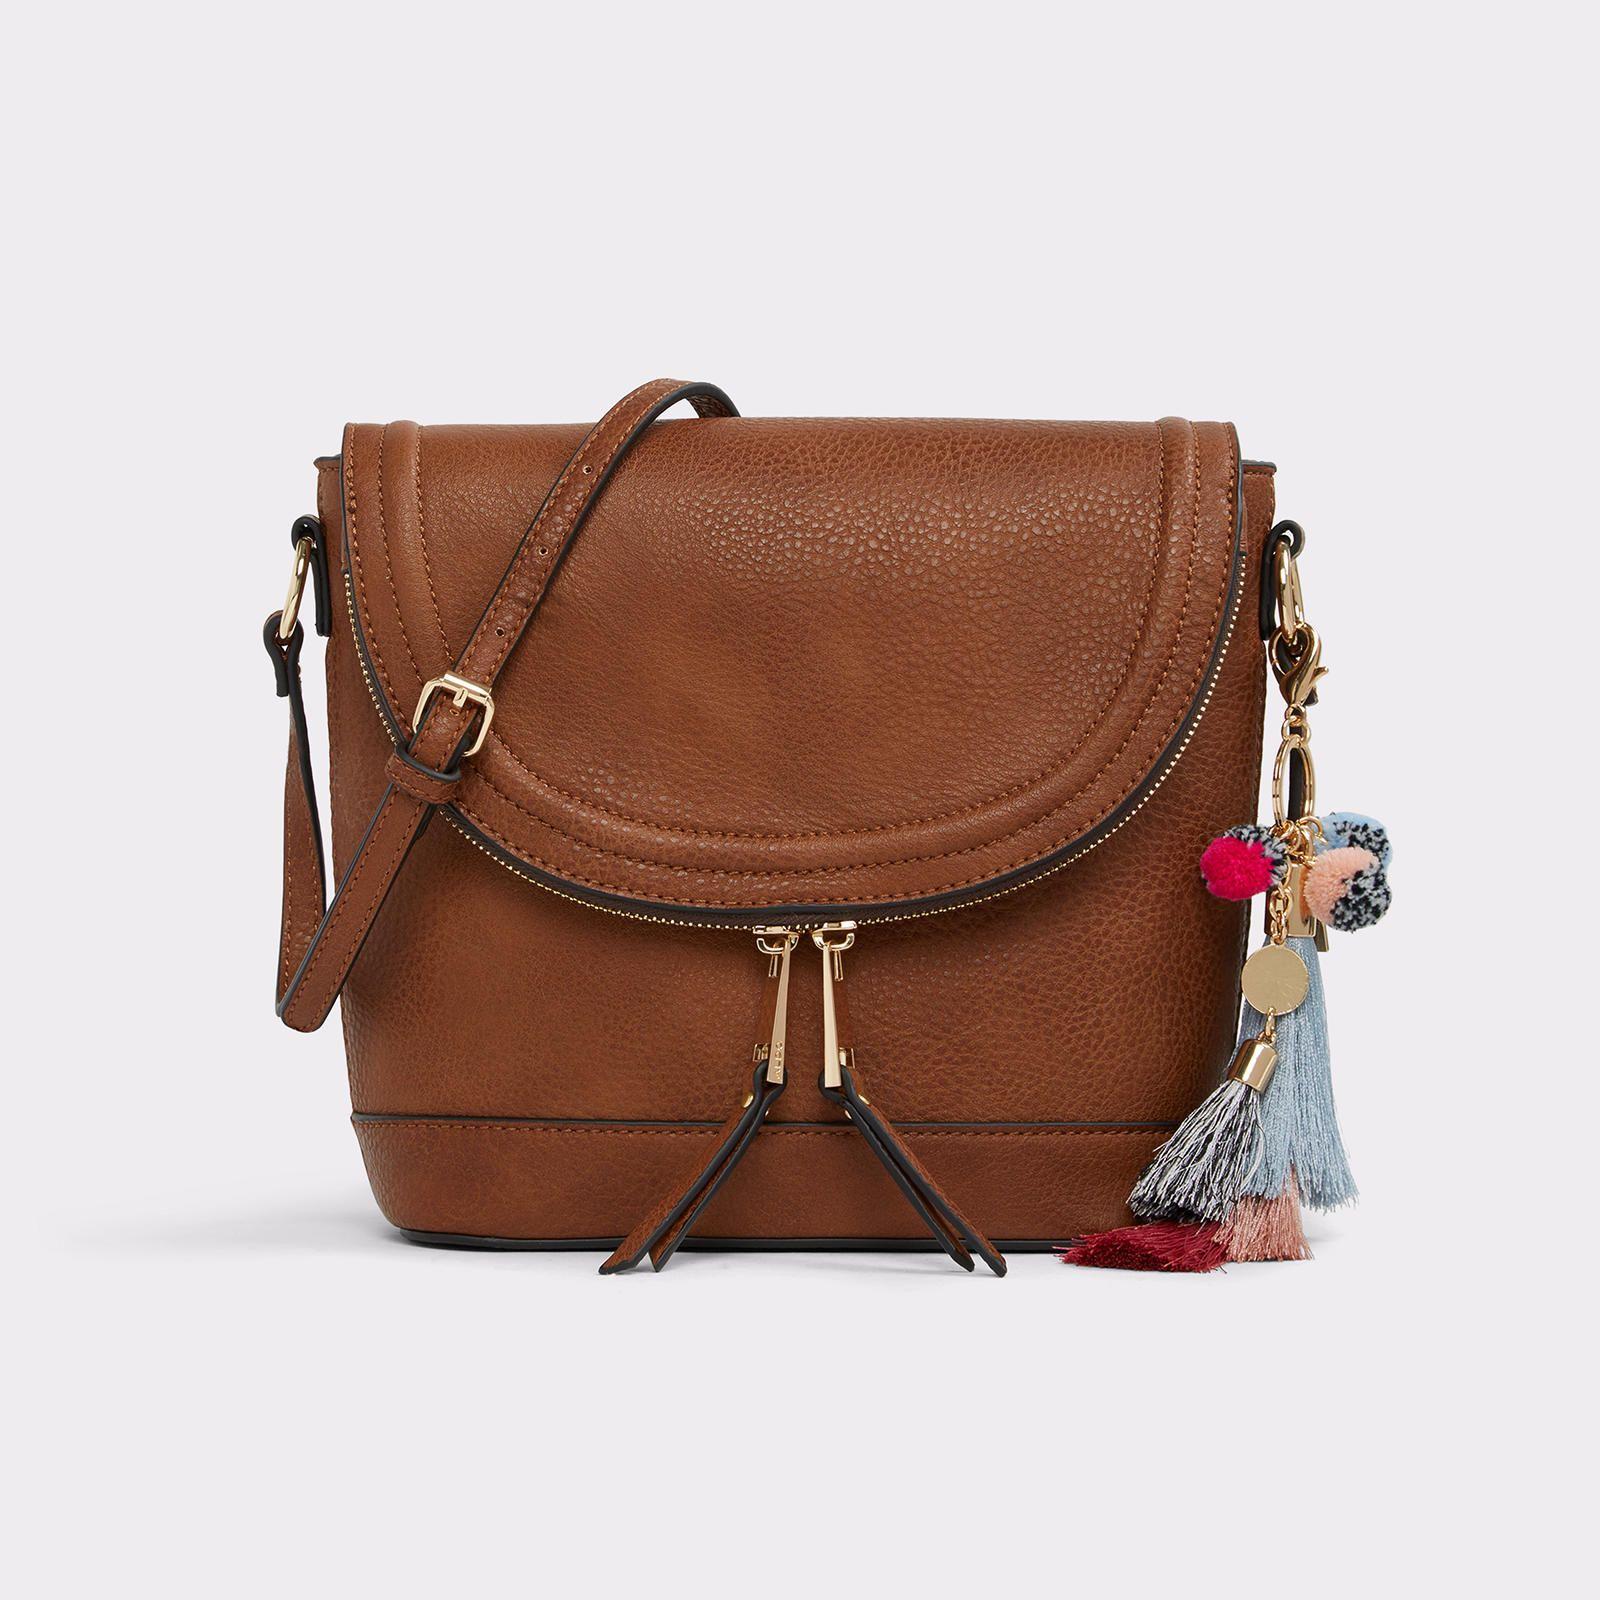 474350772d Derovina Aldo Shoes, Aldo Handbags, Tassels, Crossbody Bag, Backpacks, Tops,